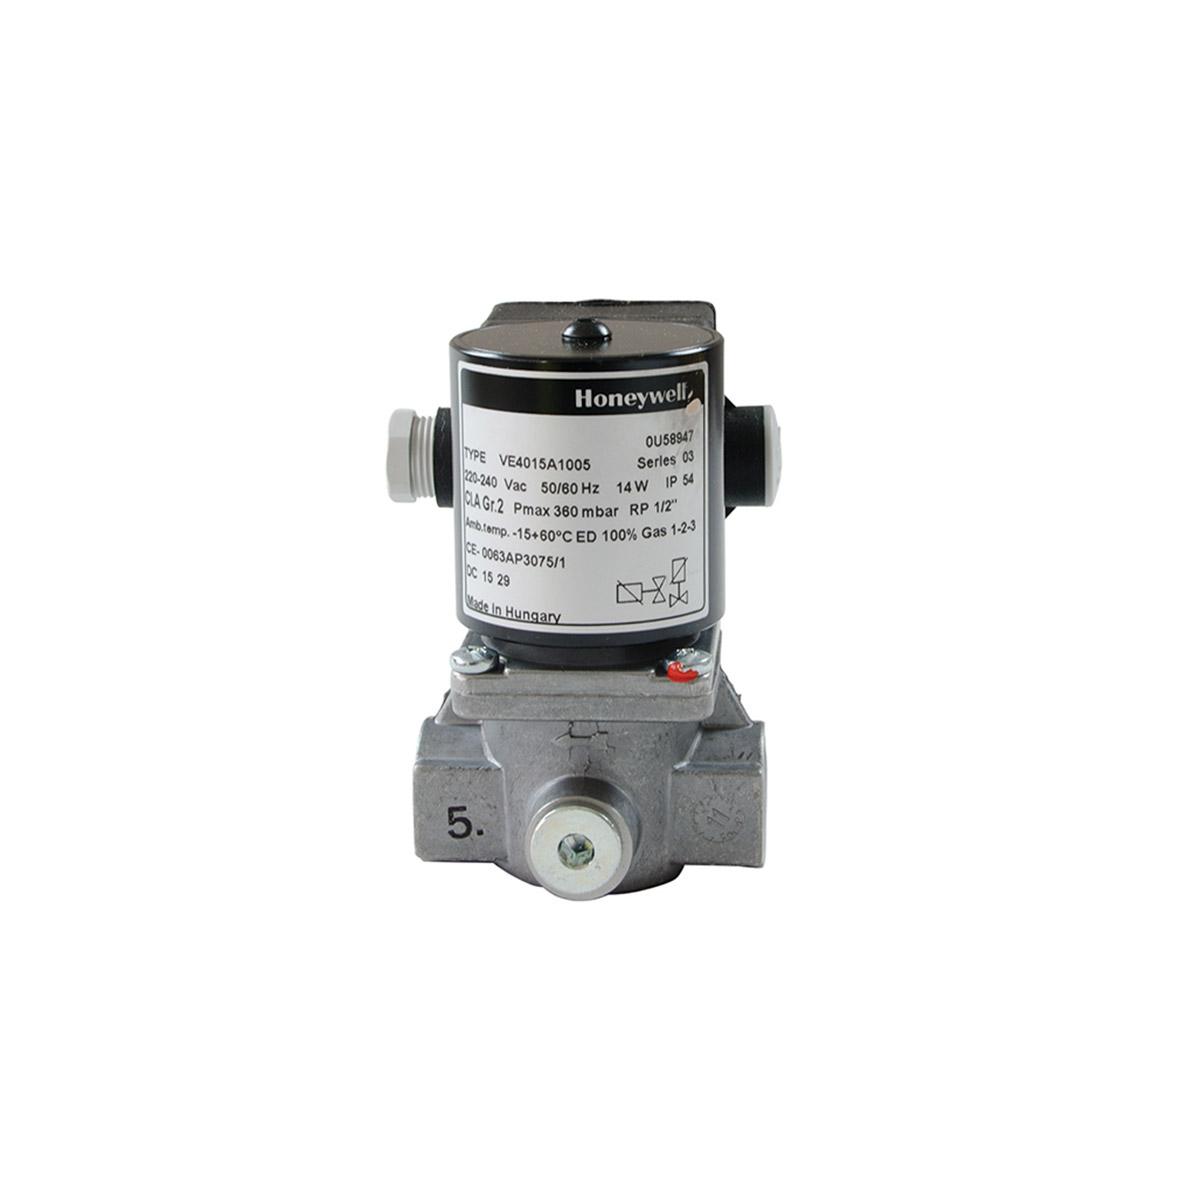 CaterGuard M-VE050 1/2 Inch Gas Solenoid Valve